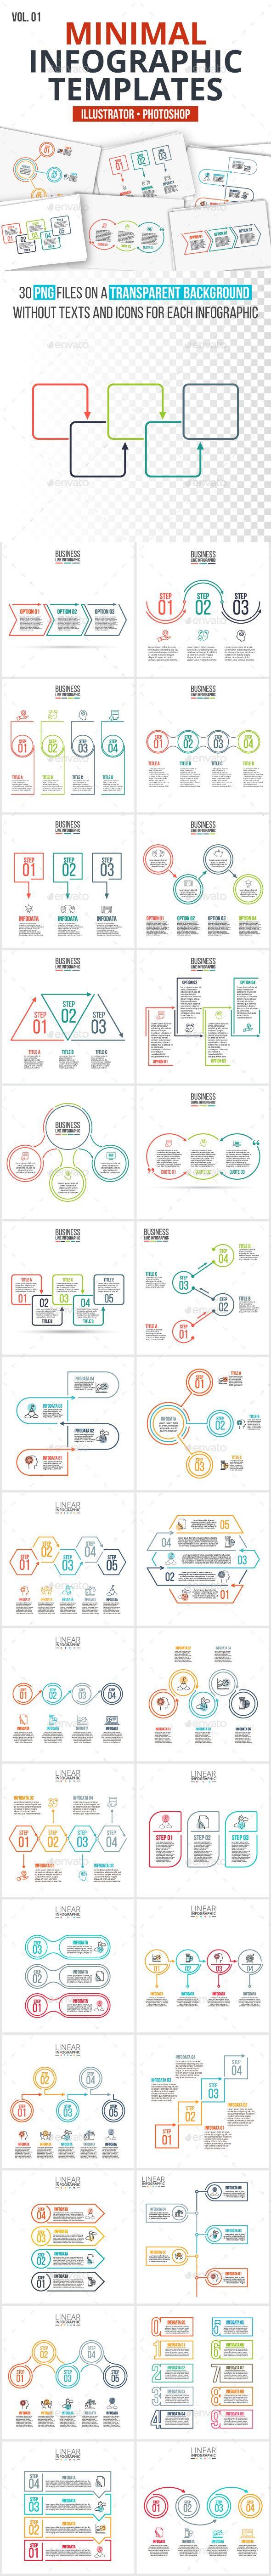 Minimal infographics pack v.01 - #Infographics